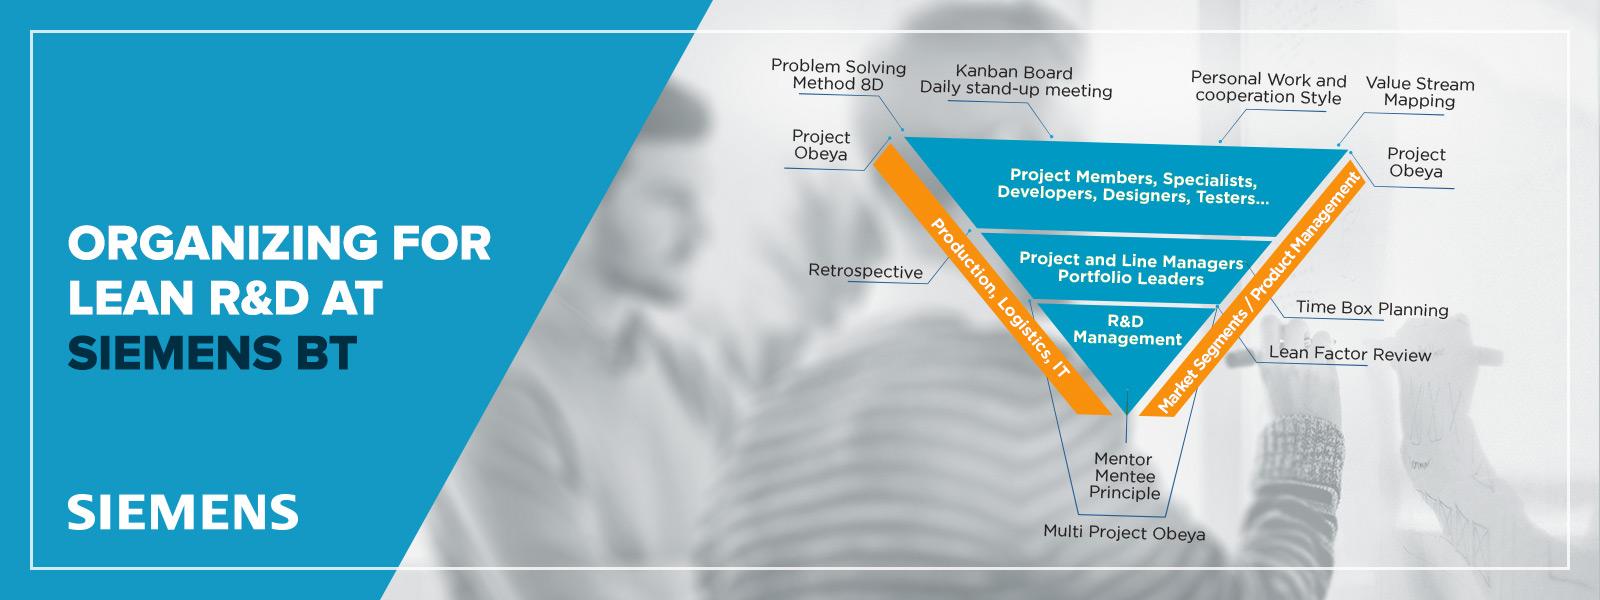 LAA-Blog---1.9.3-1.8.2-Siemens-Organizing-for-Lean